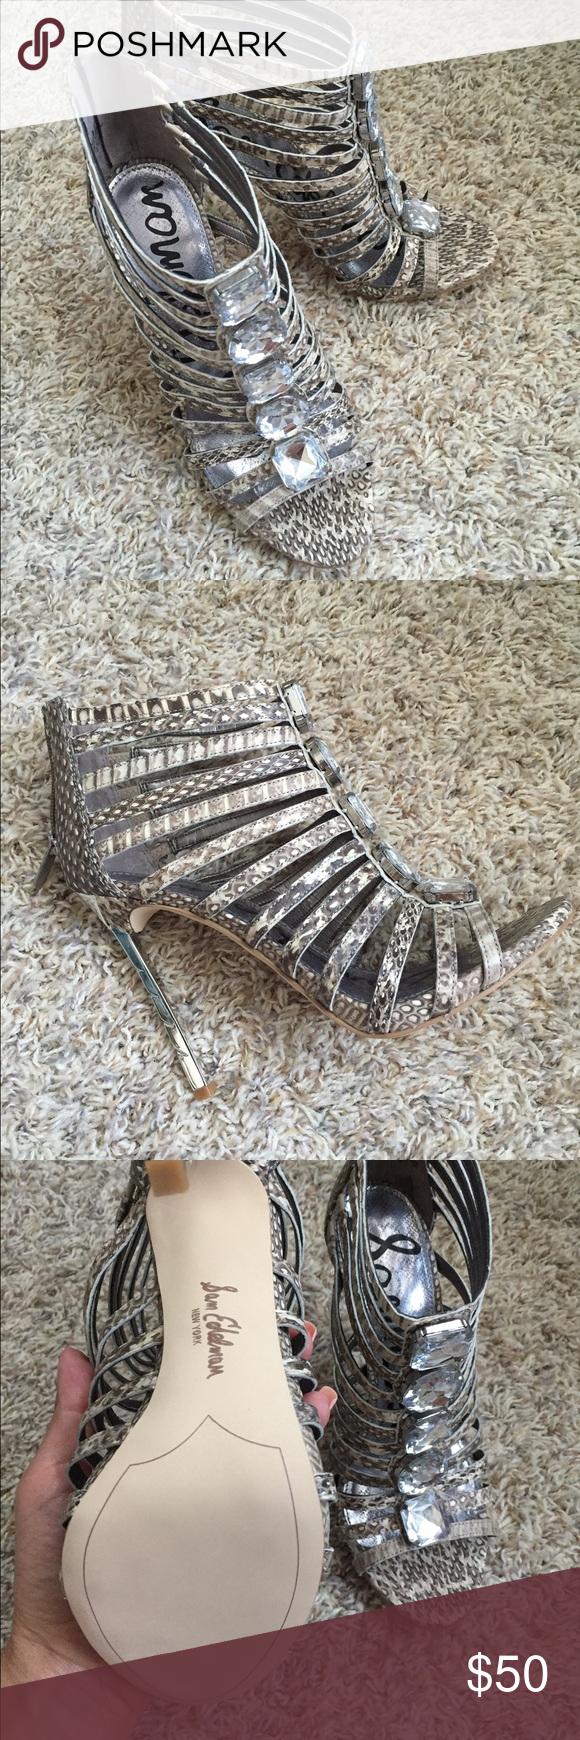 Sam Edelman Hampton Caged Heel- Snake Print, 7.5 Sam Edelman Hampton caged heel, new without box. Snake print. Sam Edelman Shoes Heels